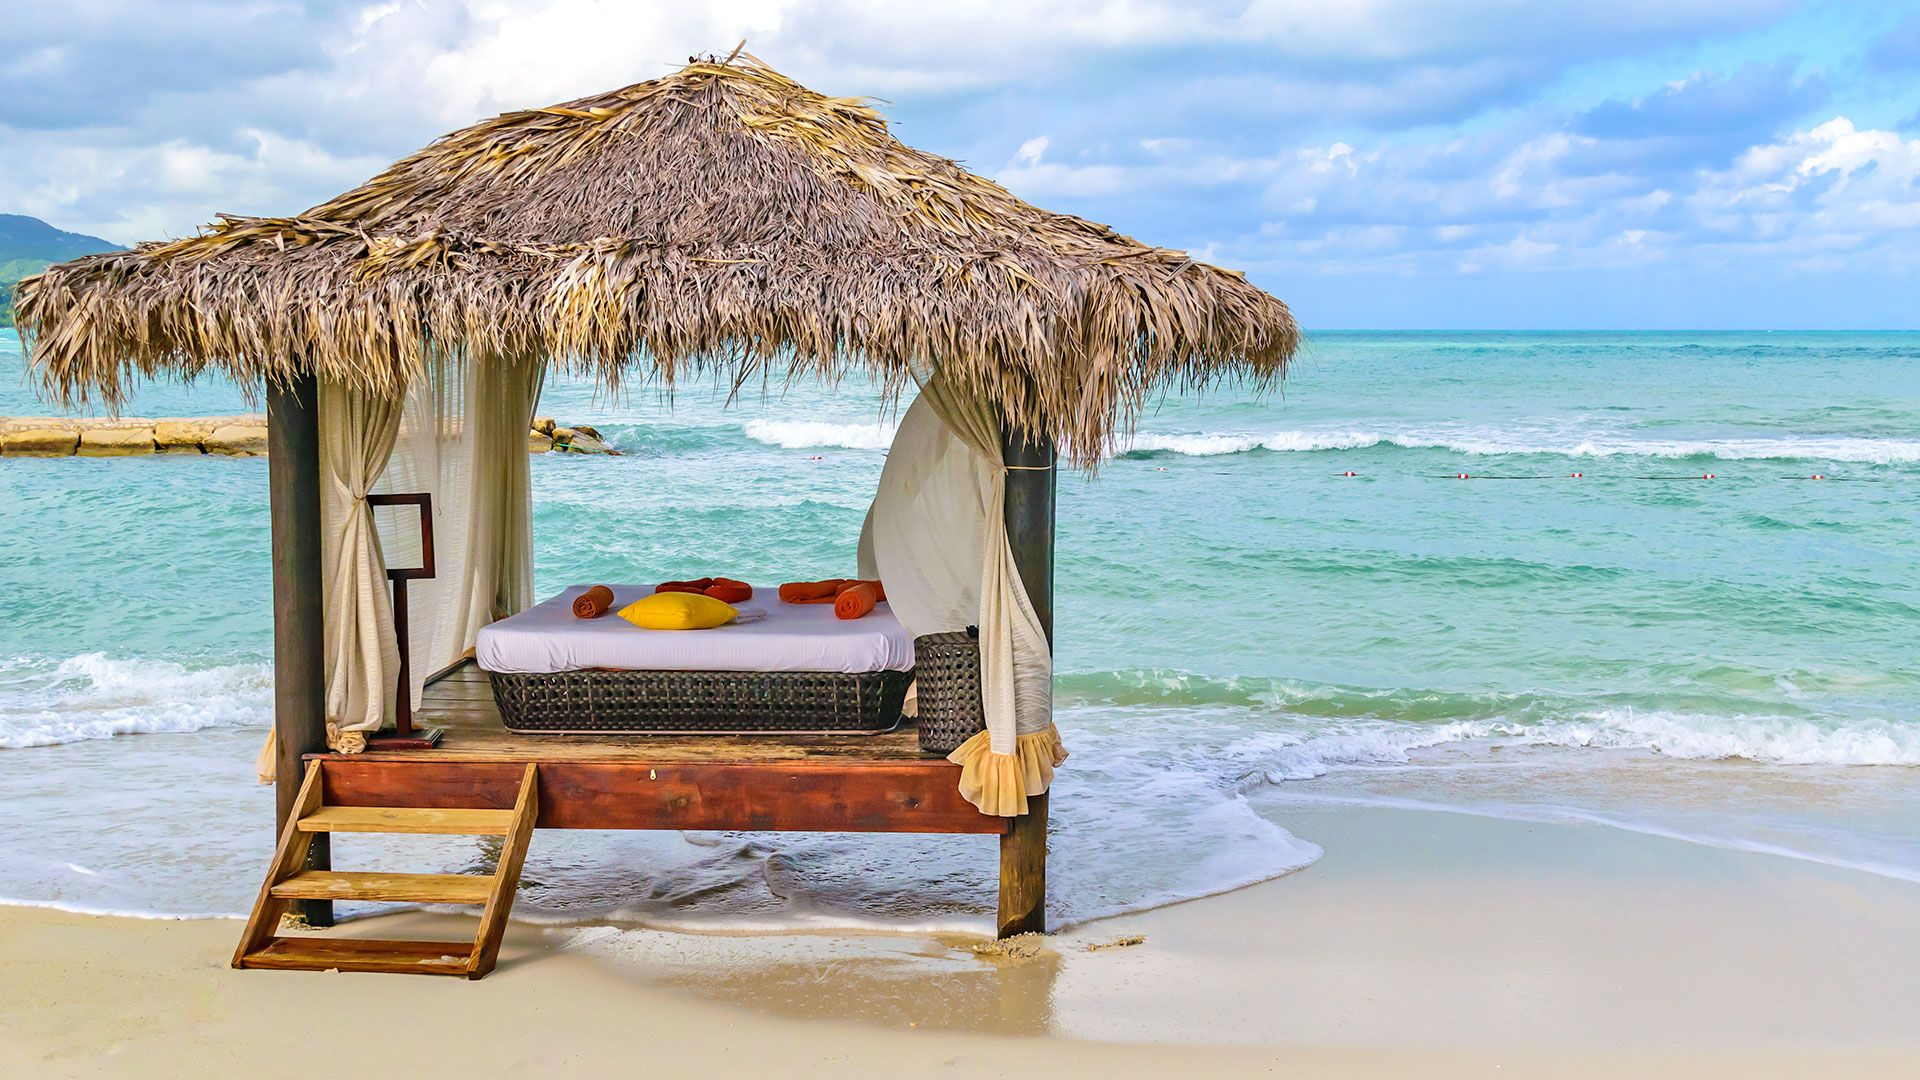 Sejur plaja Montego Bay, 9 zile - februarie 2022